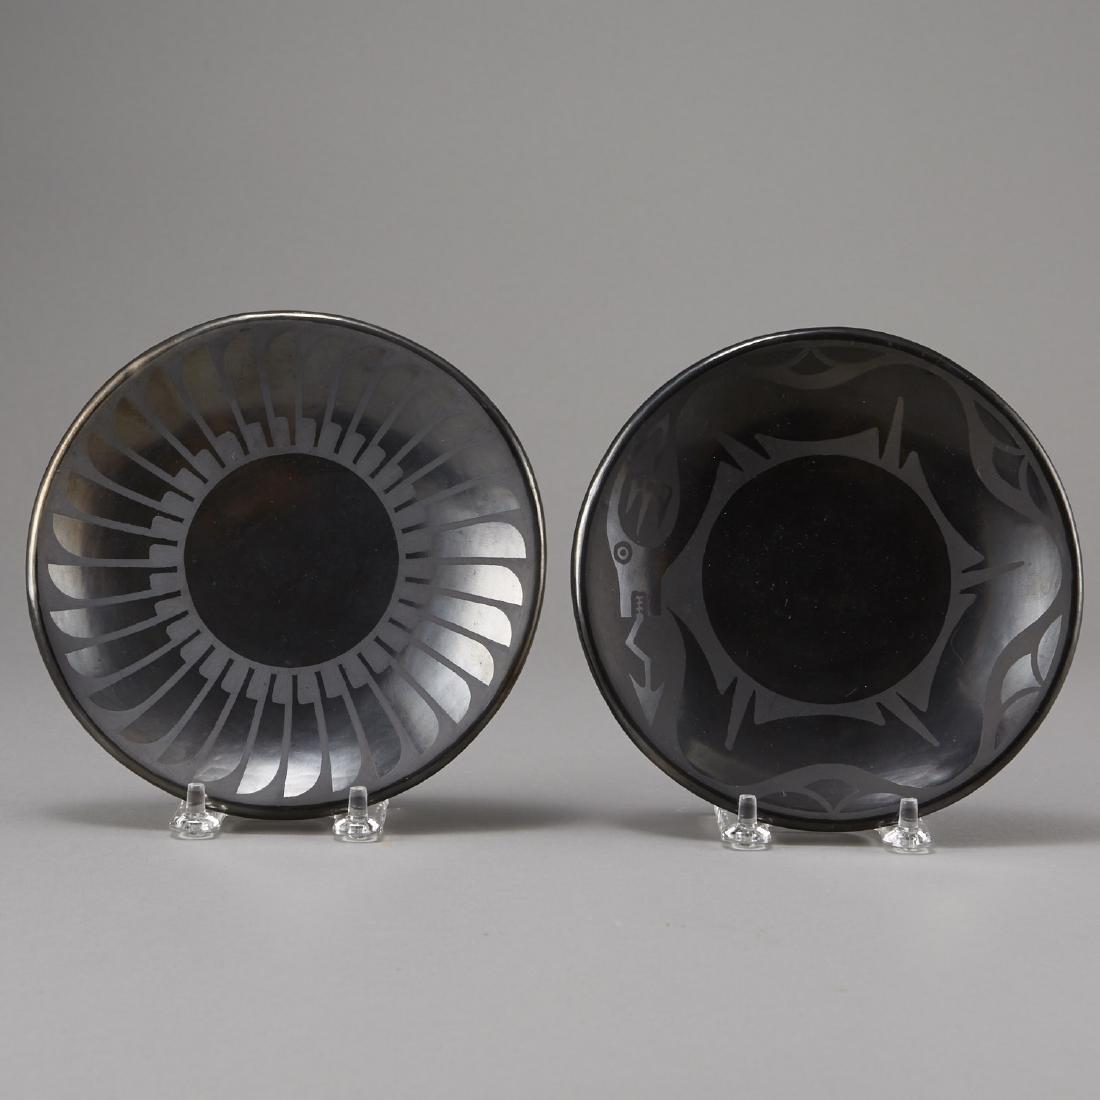 2 Maria Martinez Blackware Plates